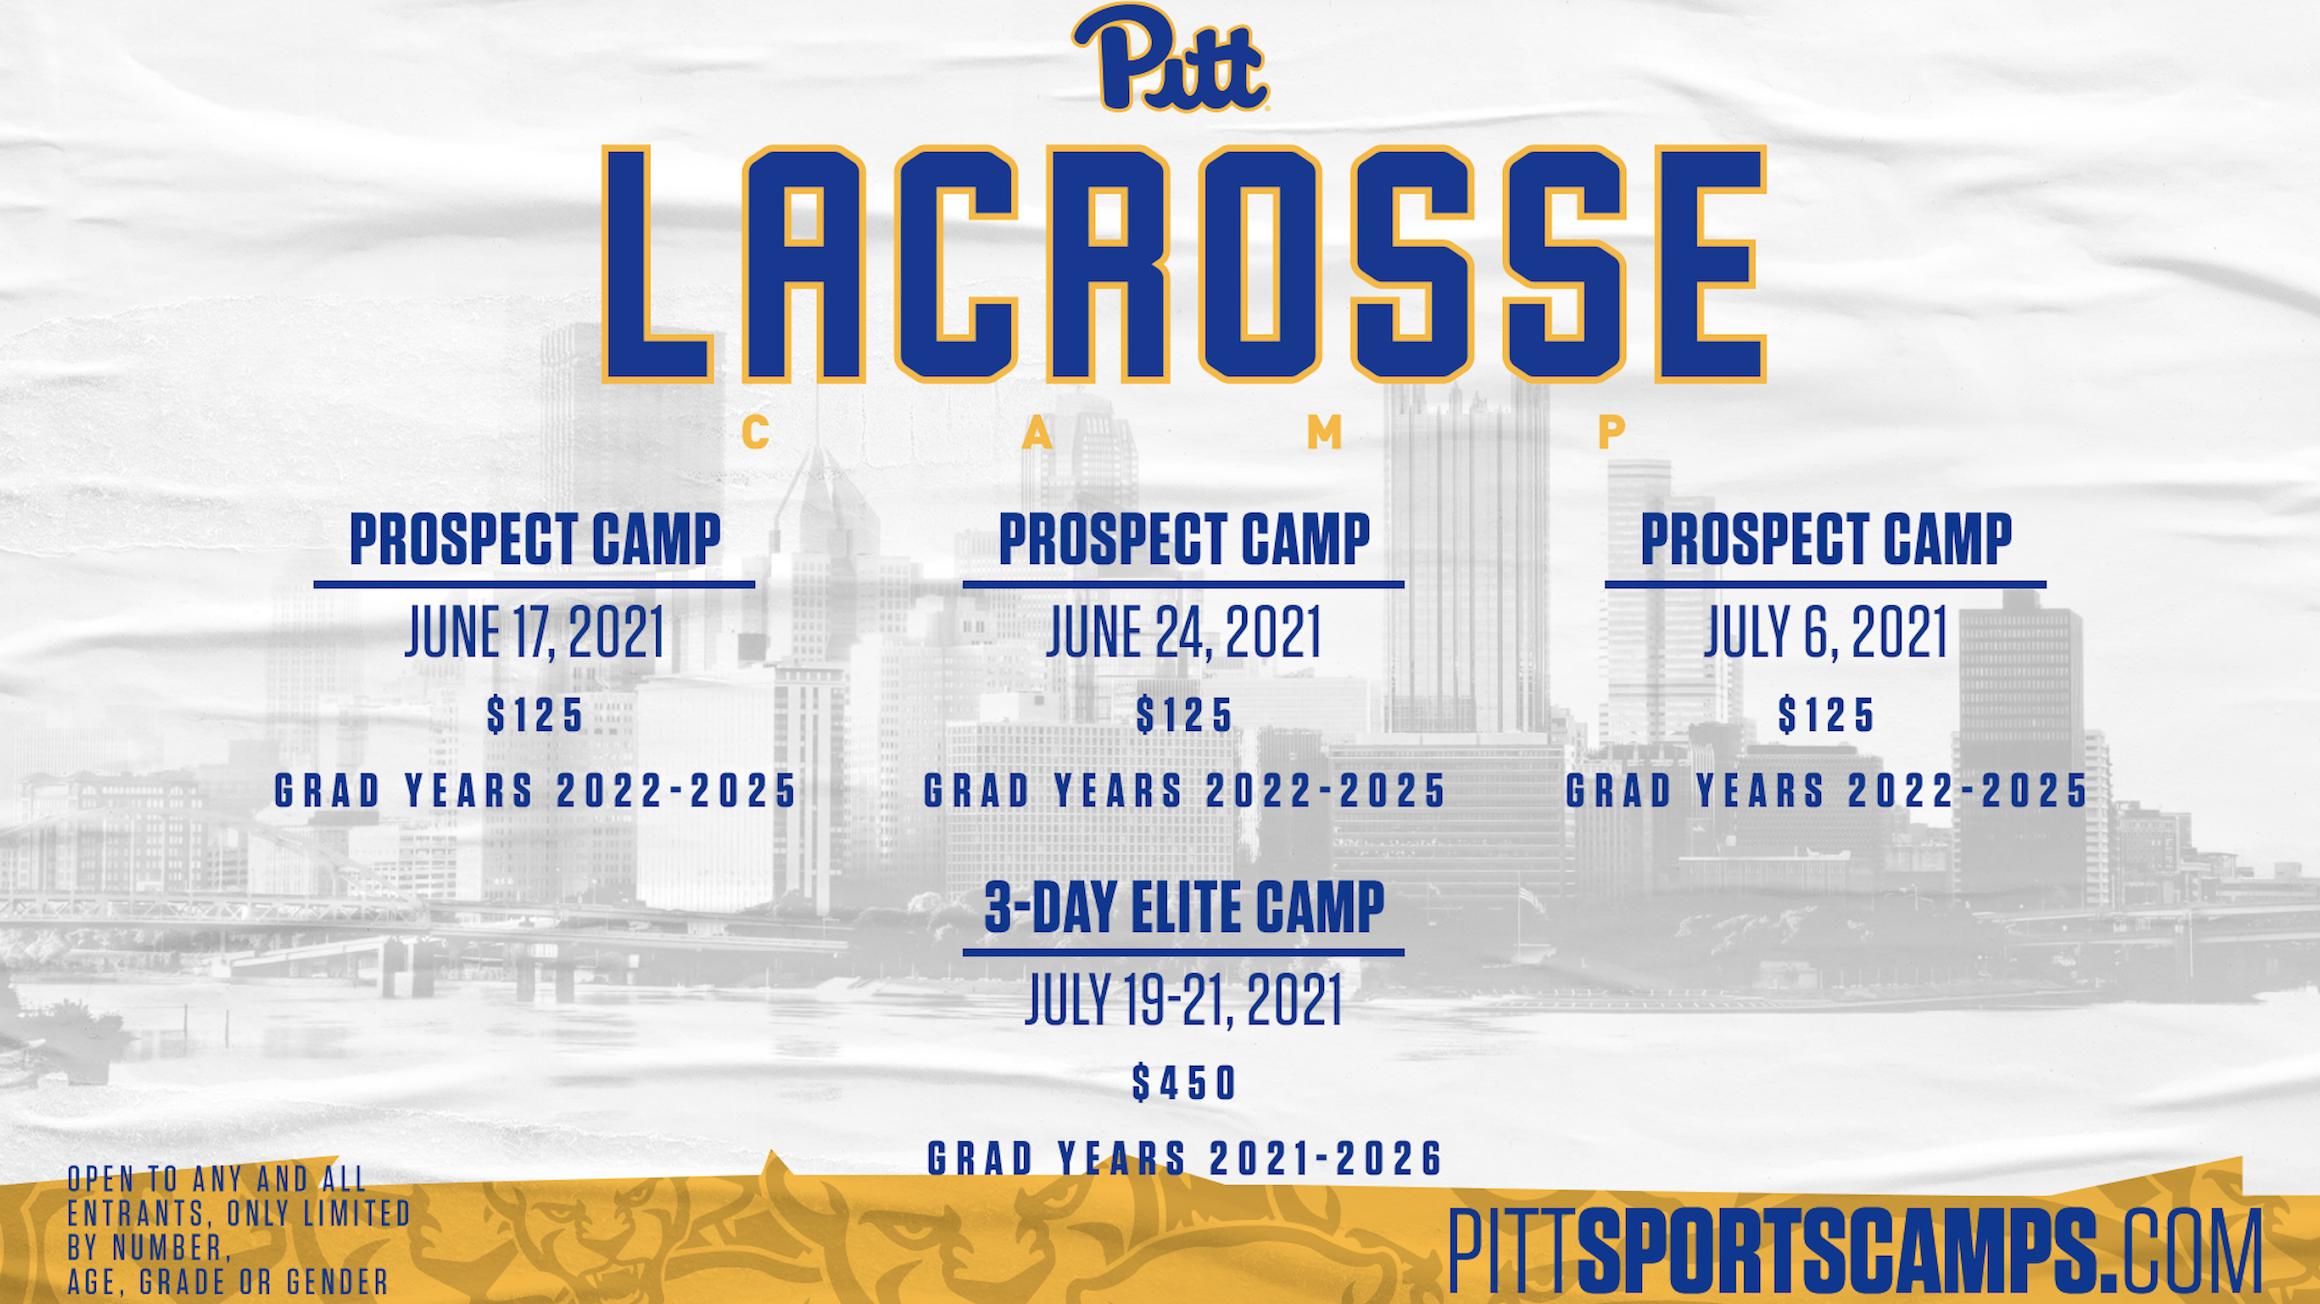 Pitt Lacrosse Camp Dates Summer 2021